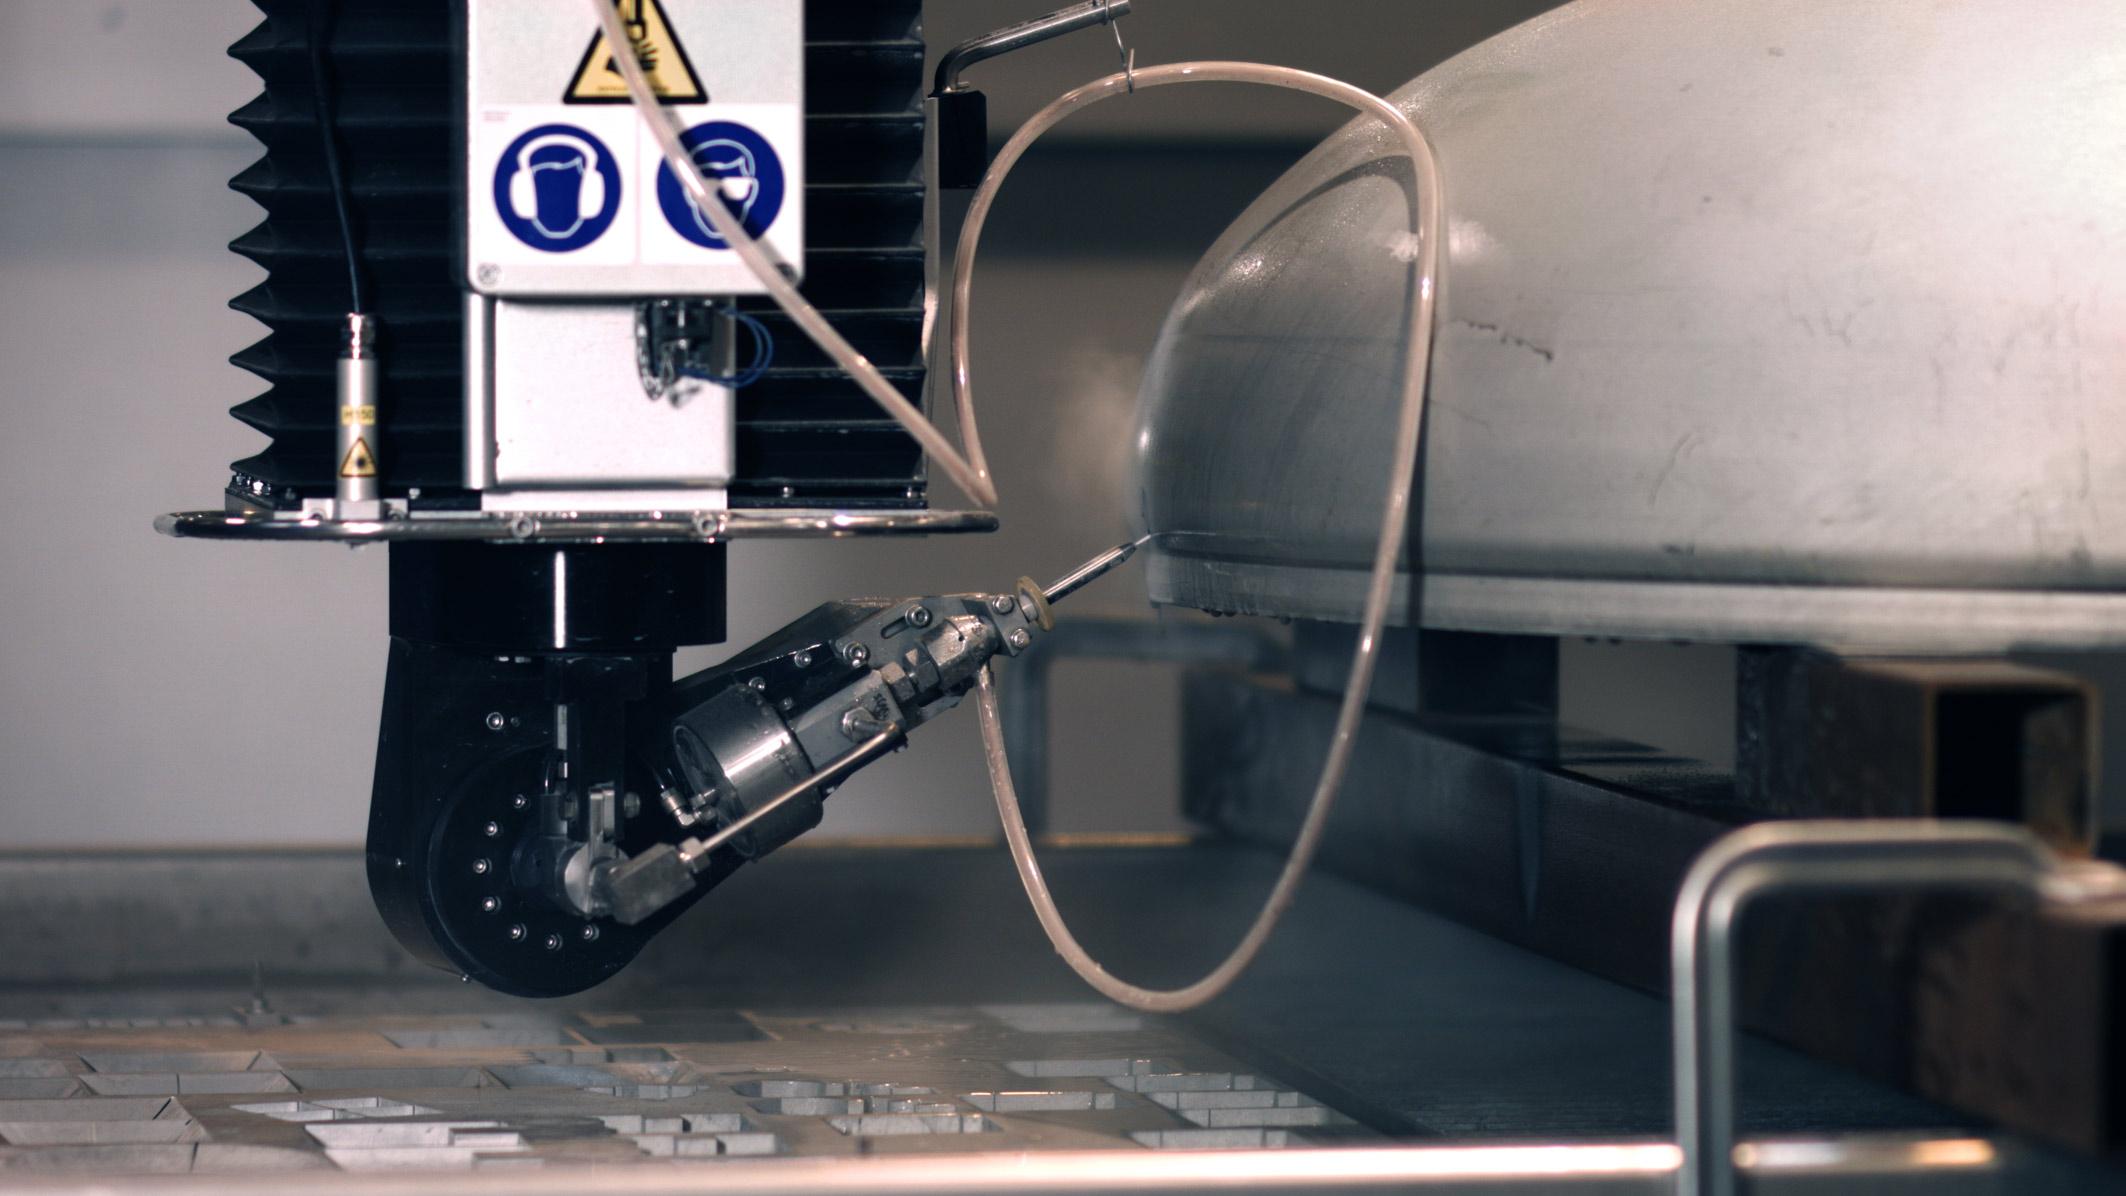 Redefining full 3D abrasive waterjet cutting - Water Jet Sweden